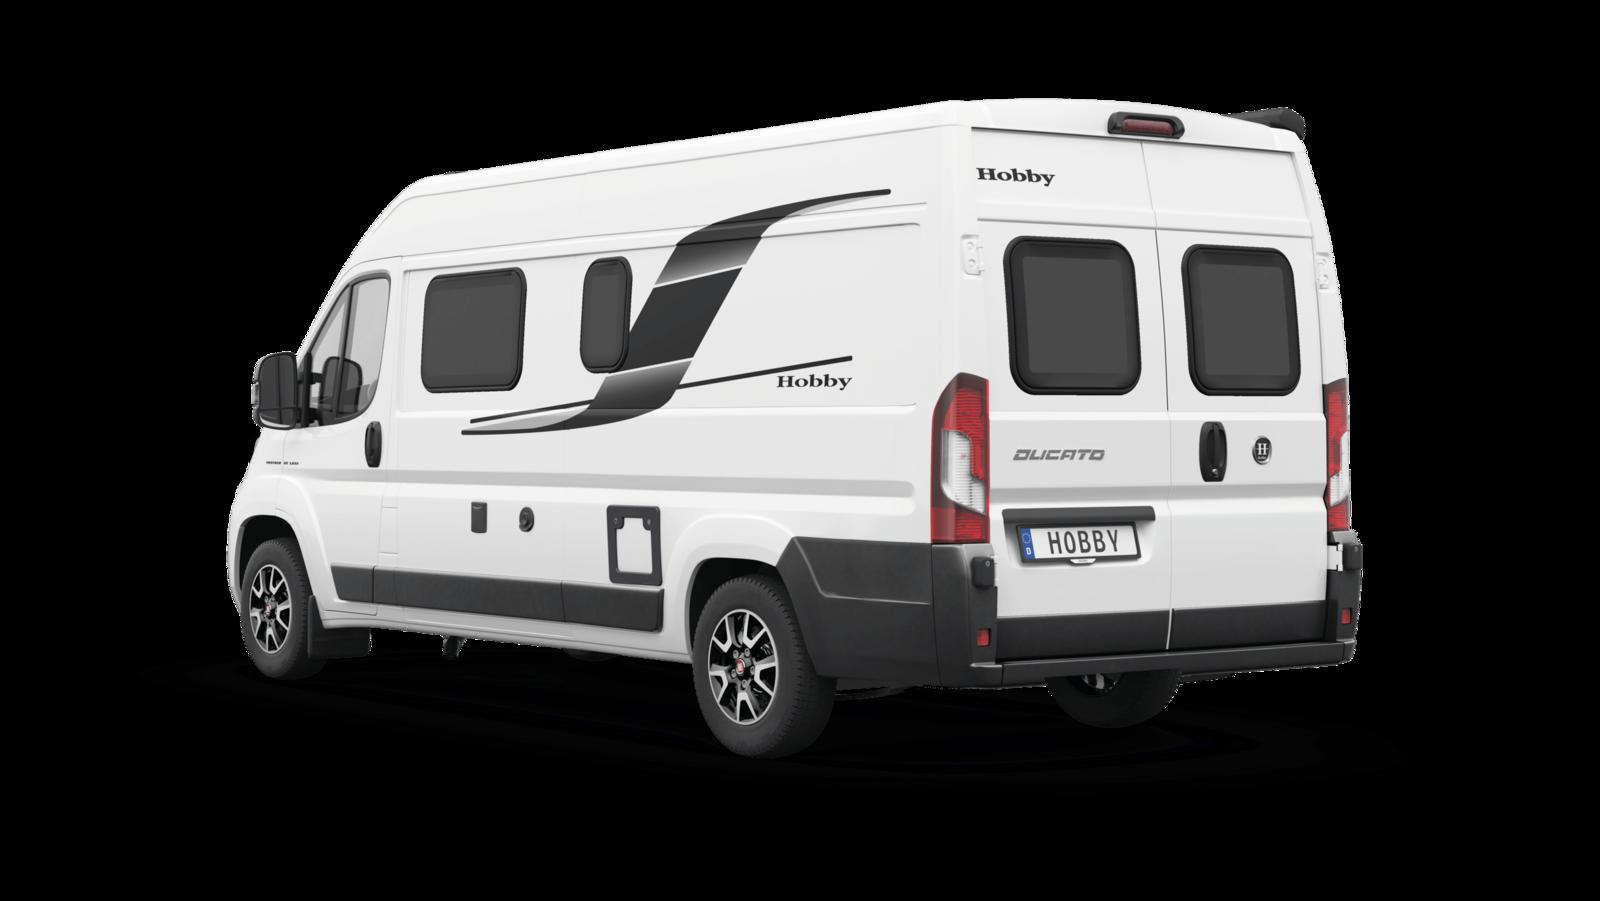 2022-KW-Freisteller-Heck-Vantana-De-Luxe-K65-ET-weiss-Rahmenfenster-PRESSE-lowres